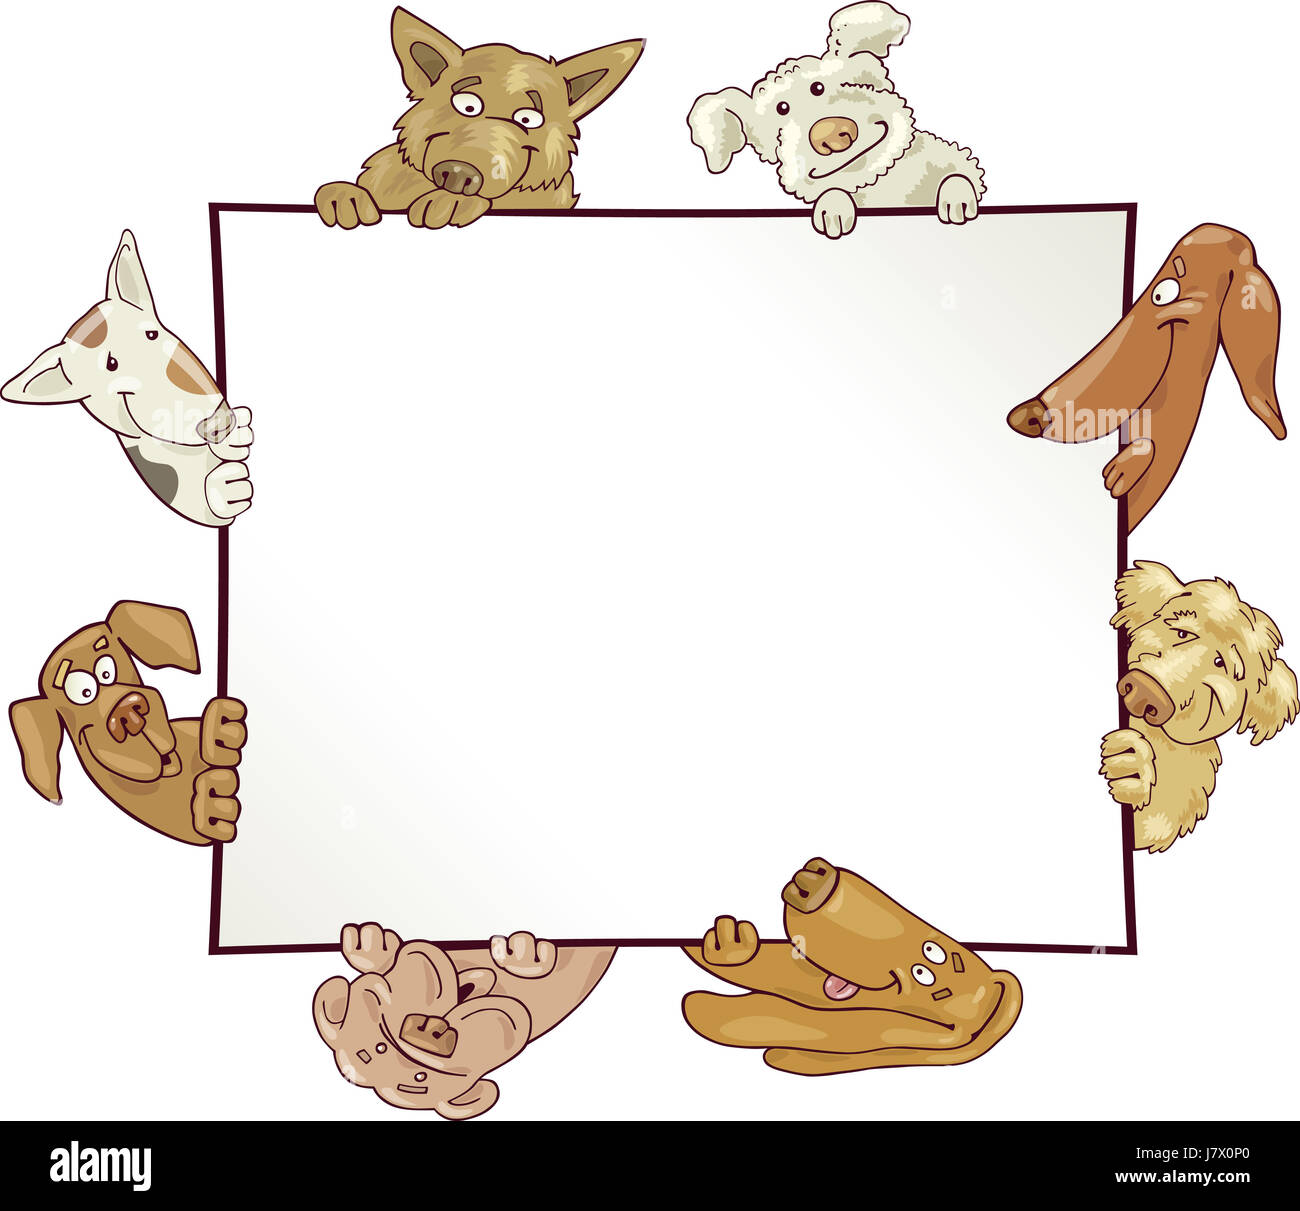 Perro Mascota Tarjeta con ilustración cartoon frame marco diseño ...